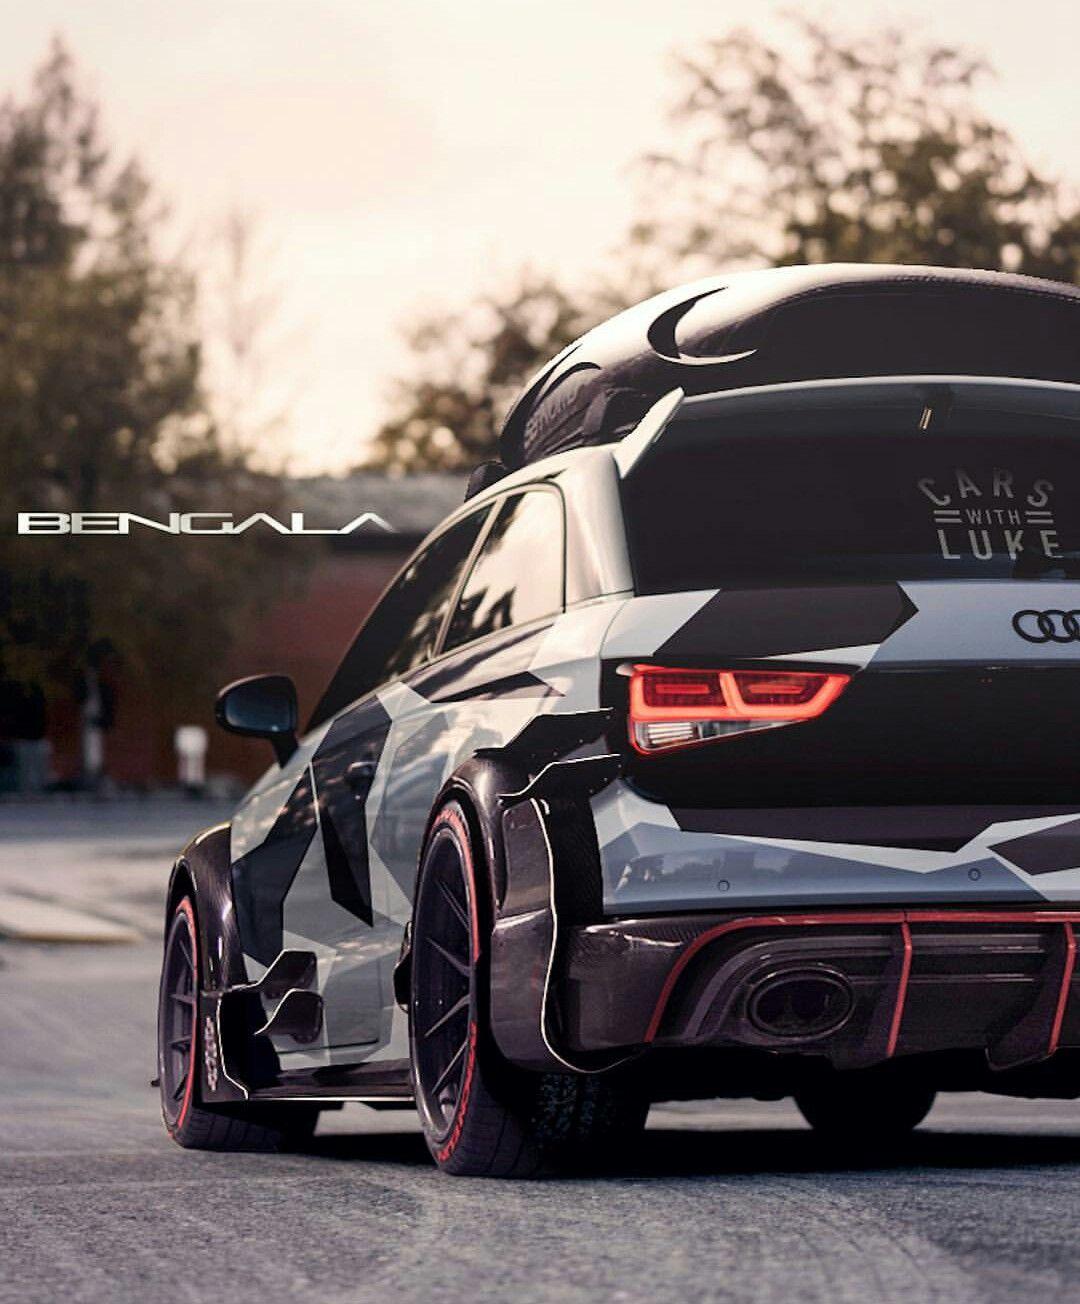 Audi A Custom Luxury Cars Pinterest Audi Cars And Audi A - Audi custom